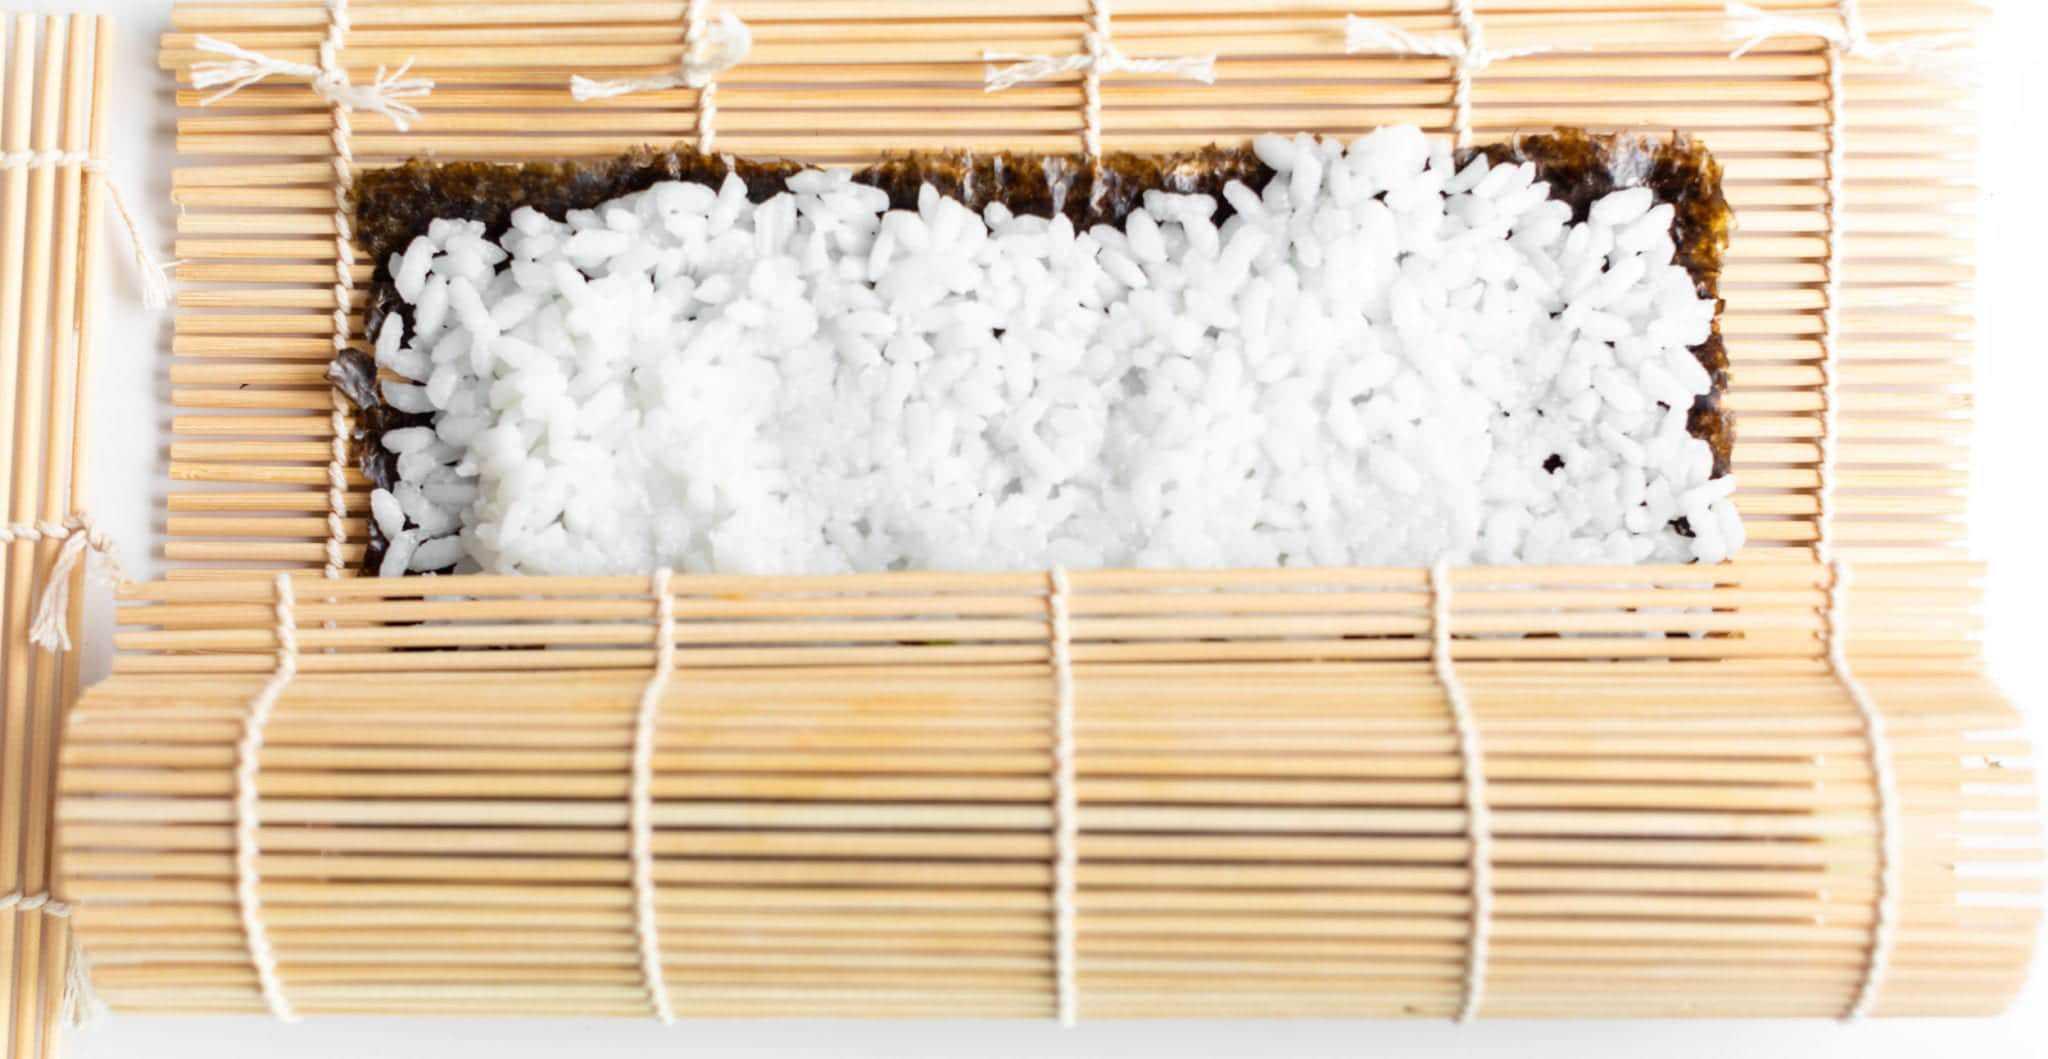 visual showing how to roll sushi with bamboo mat #sushi #spicytunamaki #sushirecipe #spicytuna #sushirollrecipes #spicytunamaki #crunchyspicytunaroll